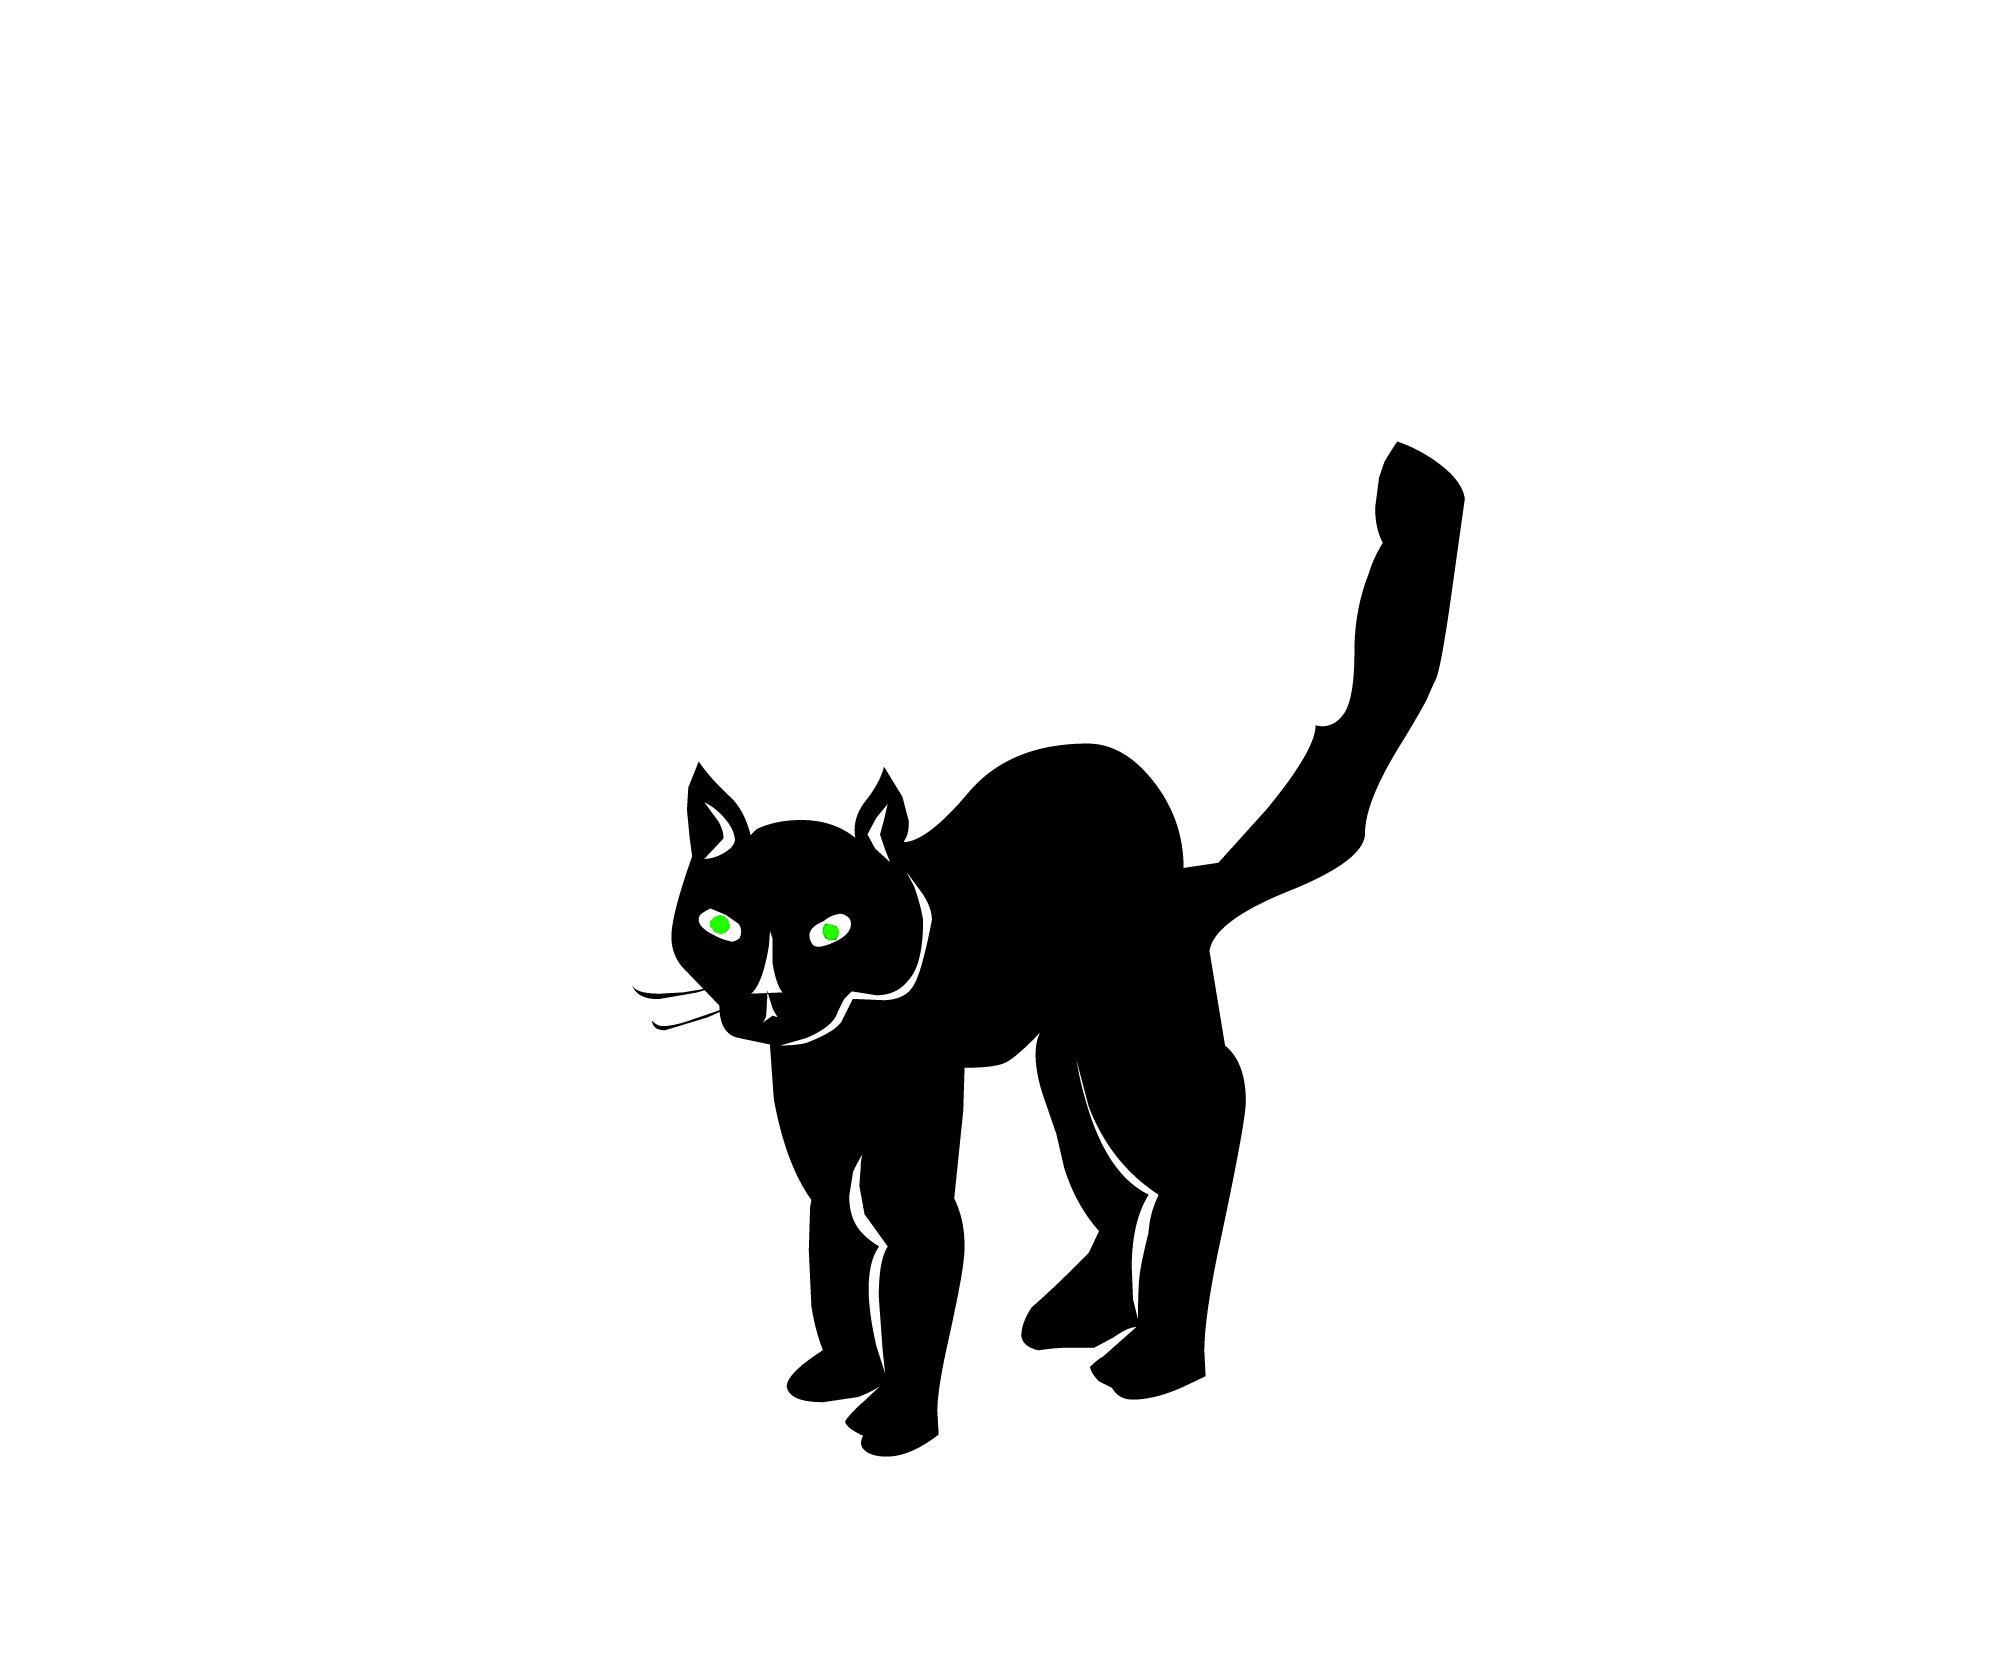 Spooky clipart halloween black cat And art black Cartoon #19202